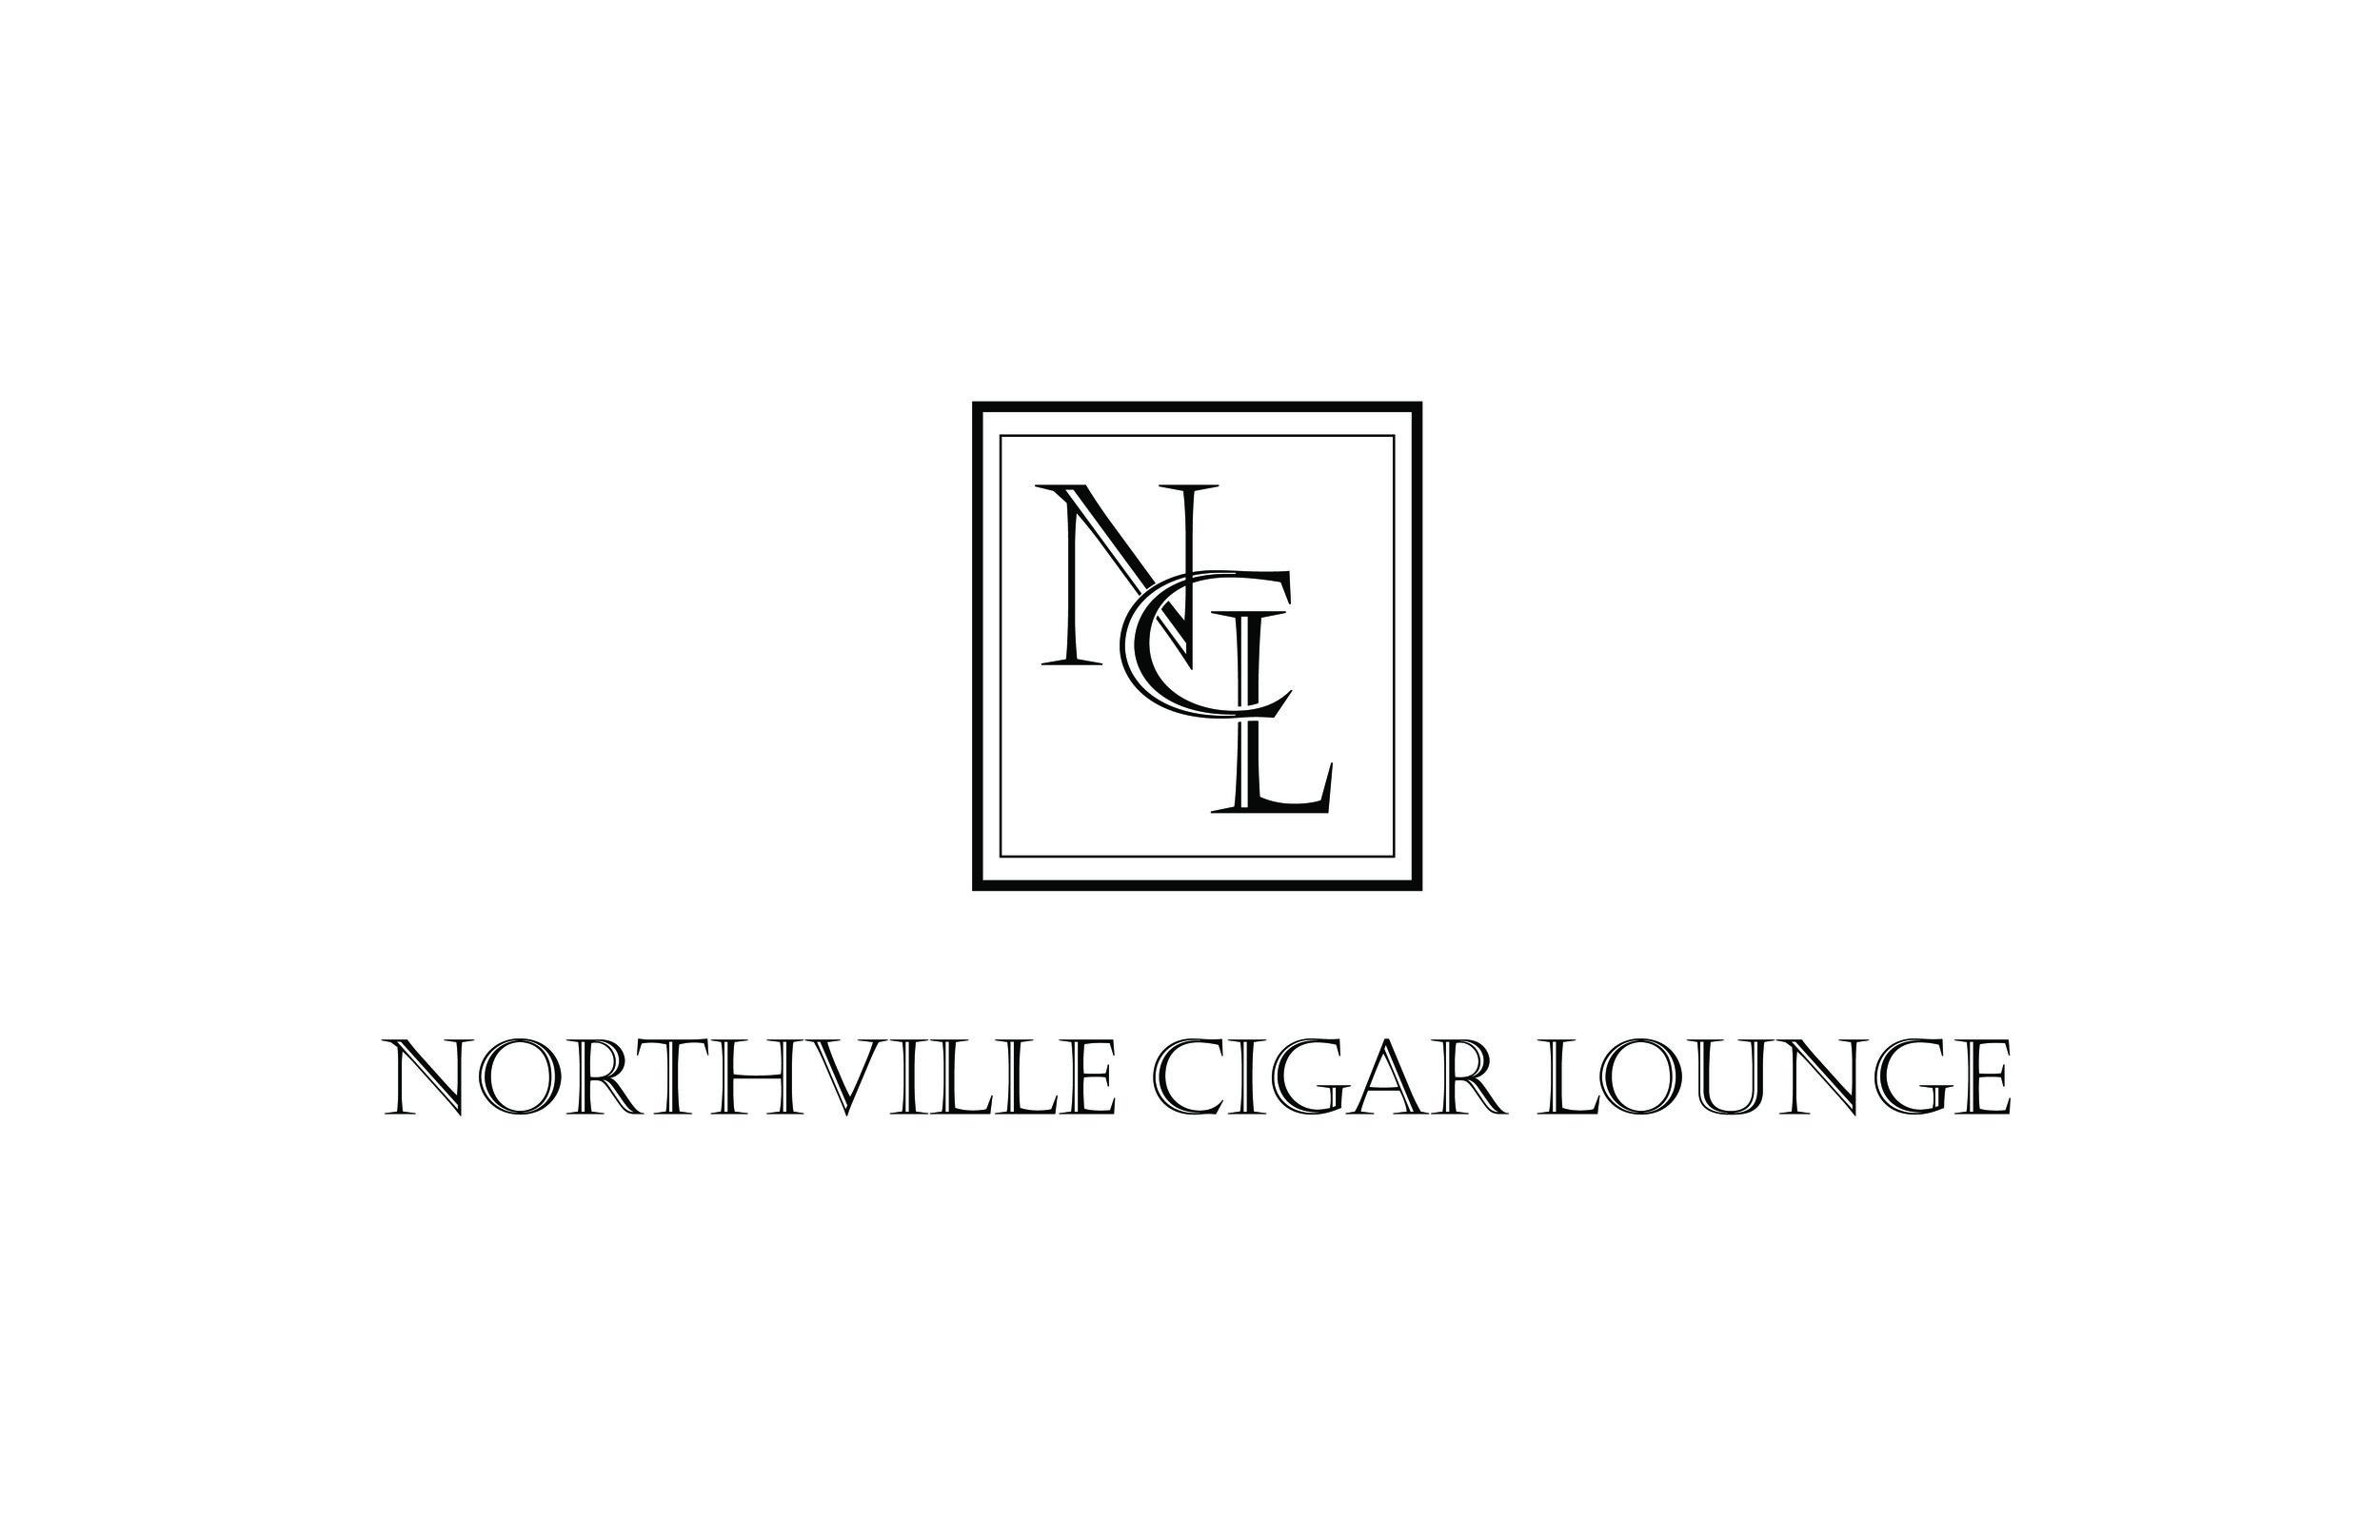 Northville Cigar Lounge.jpg